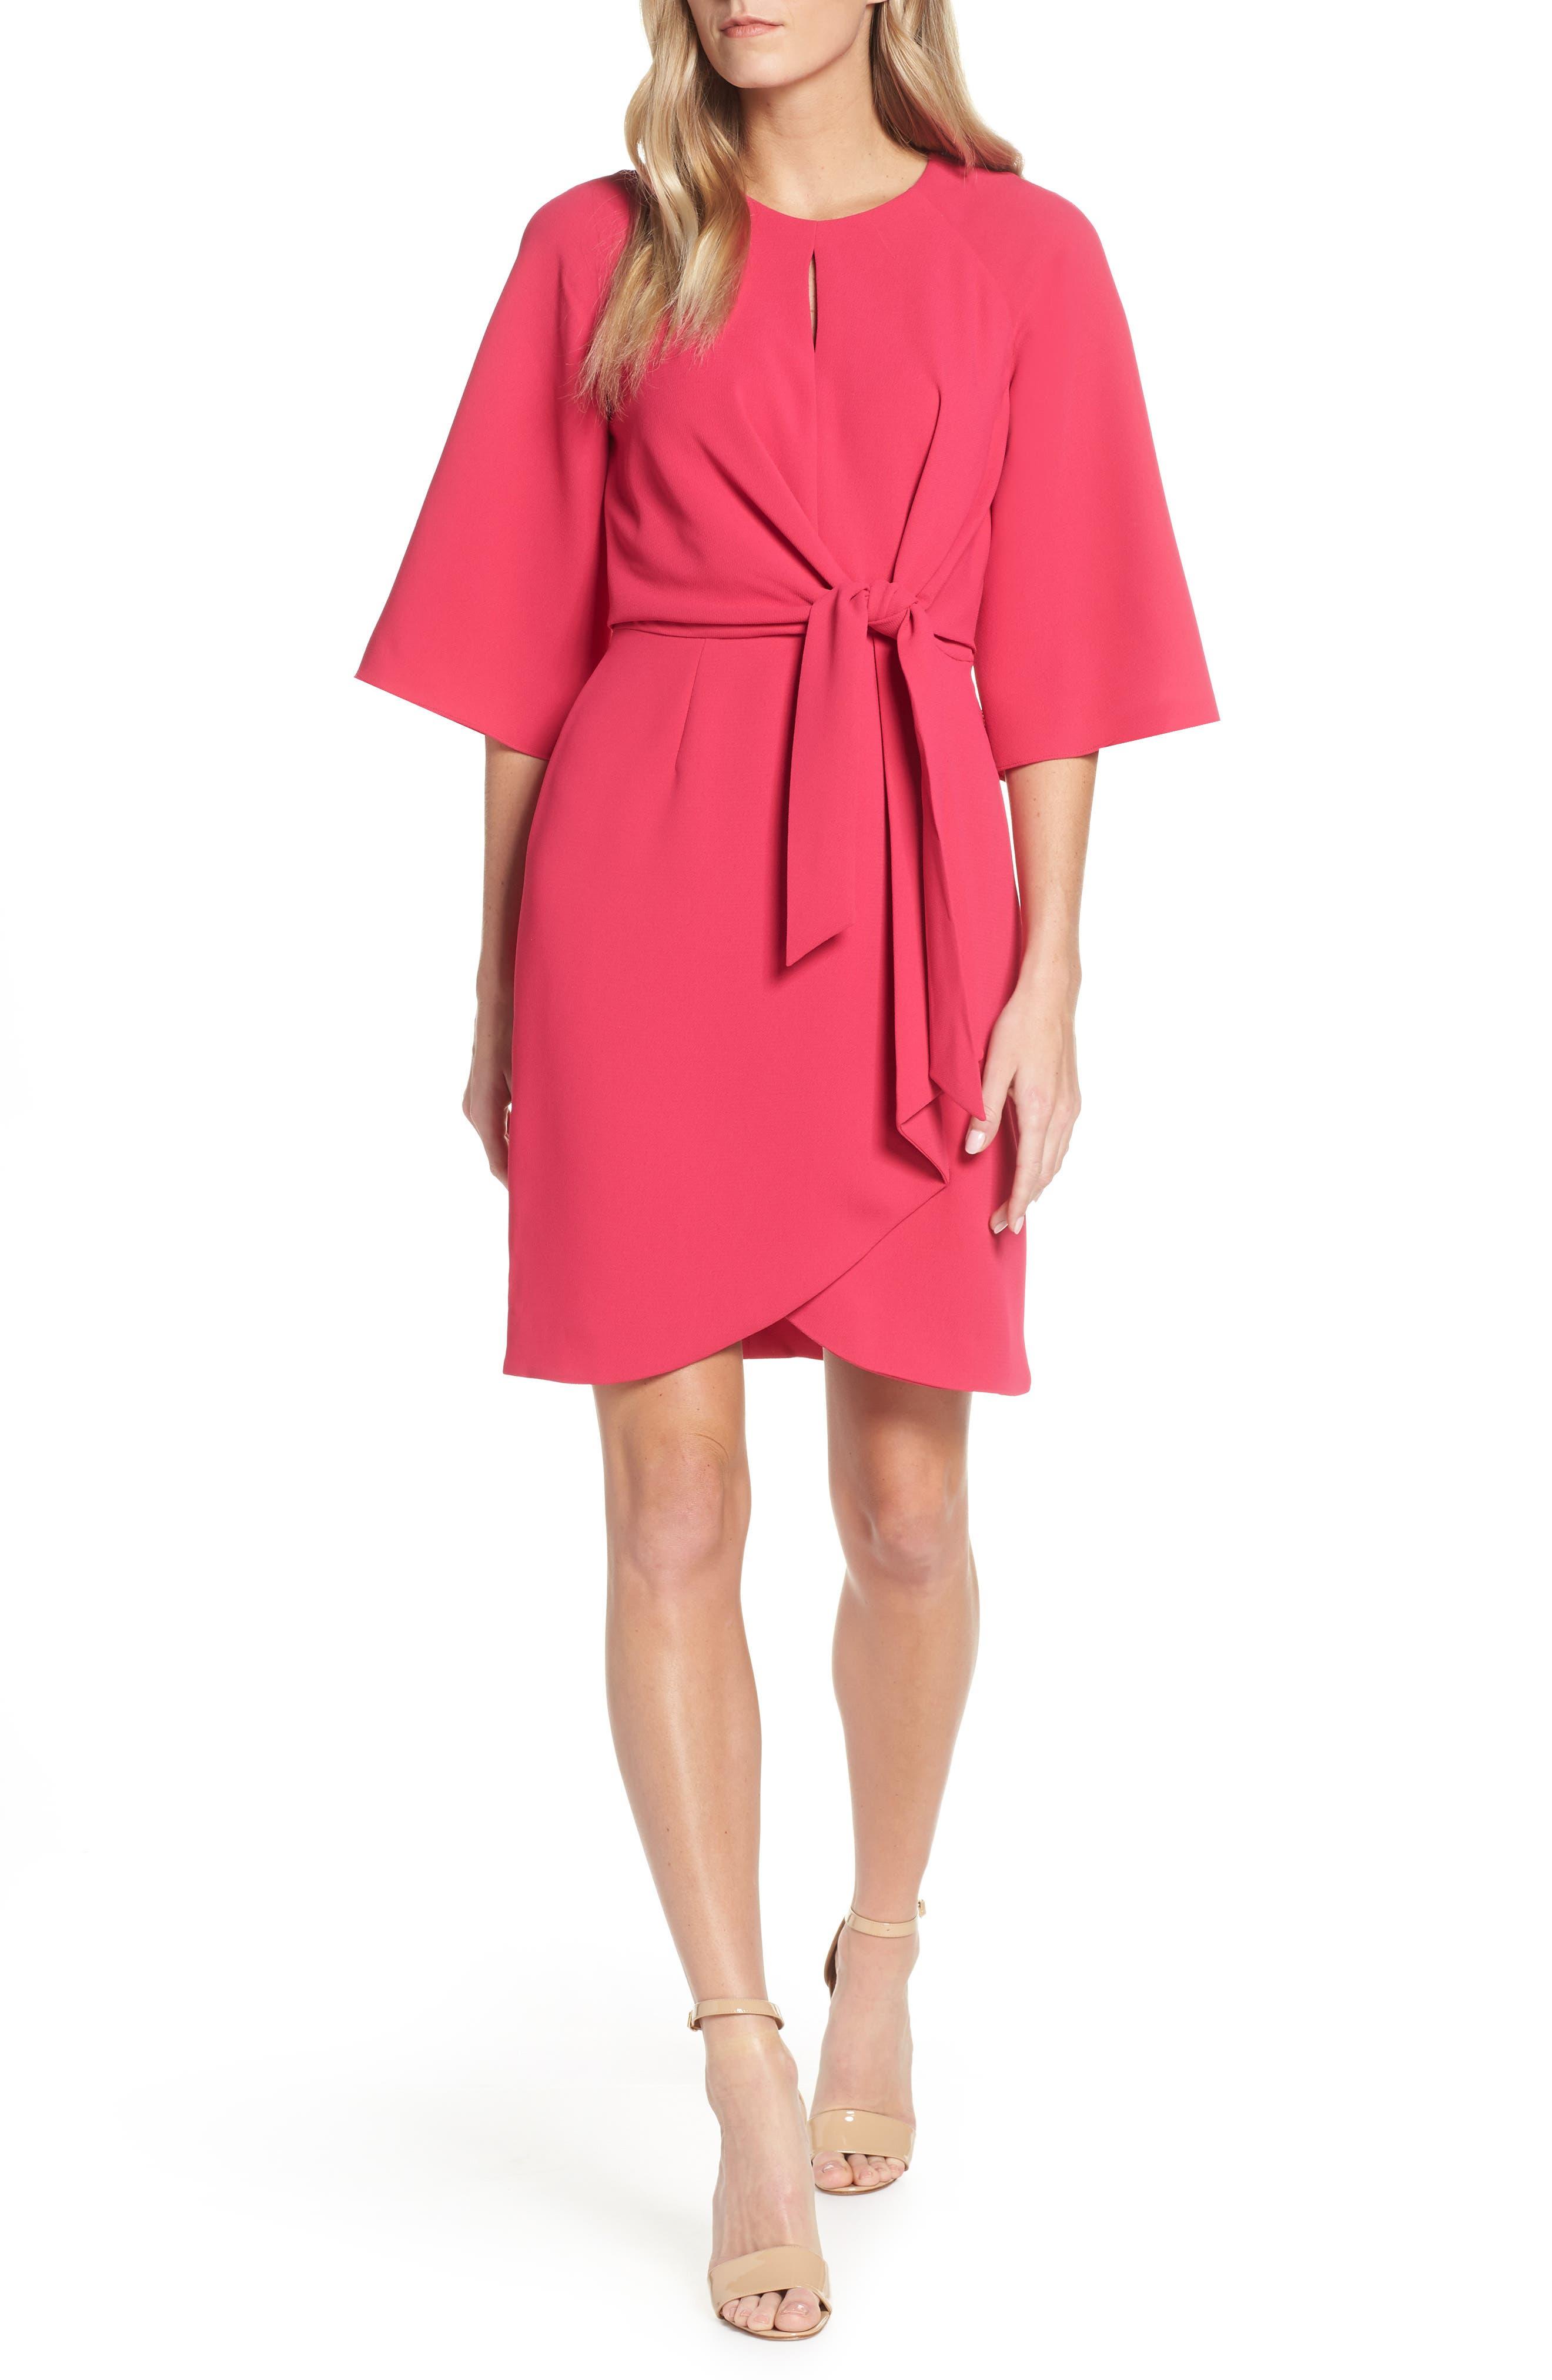 Tahari Tie Front Crepe Sheath Dress, Pink